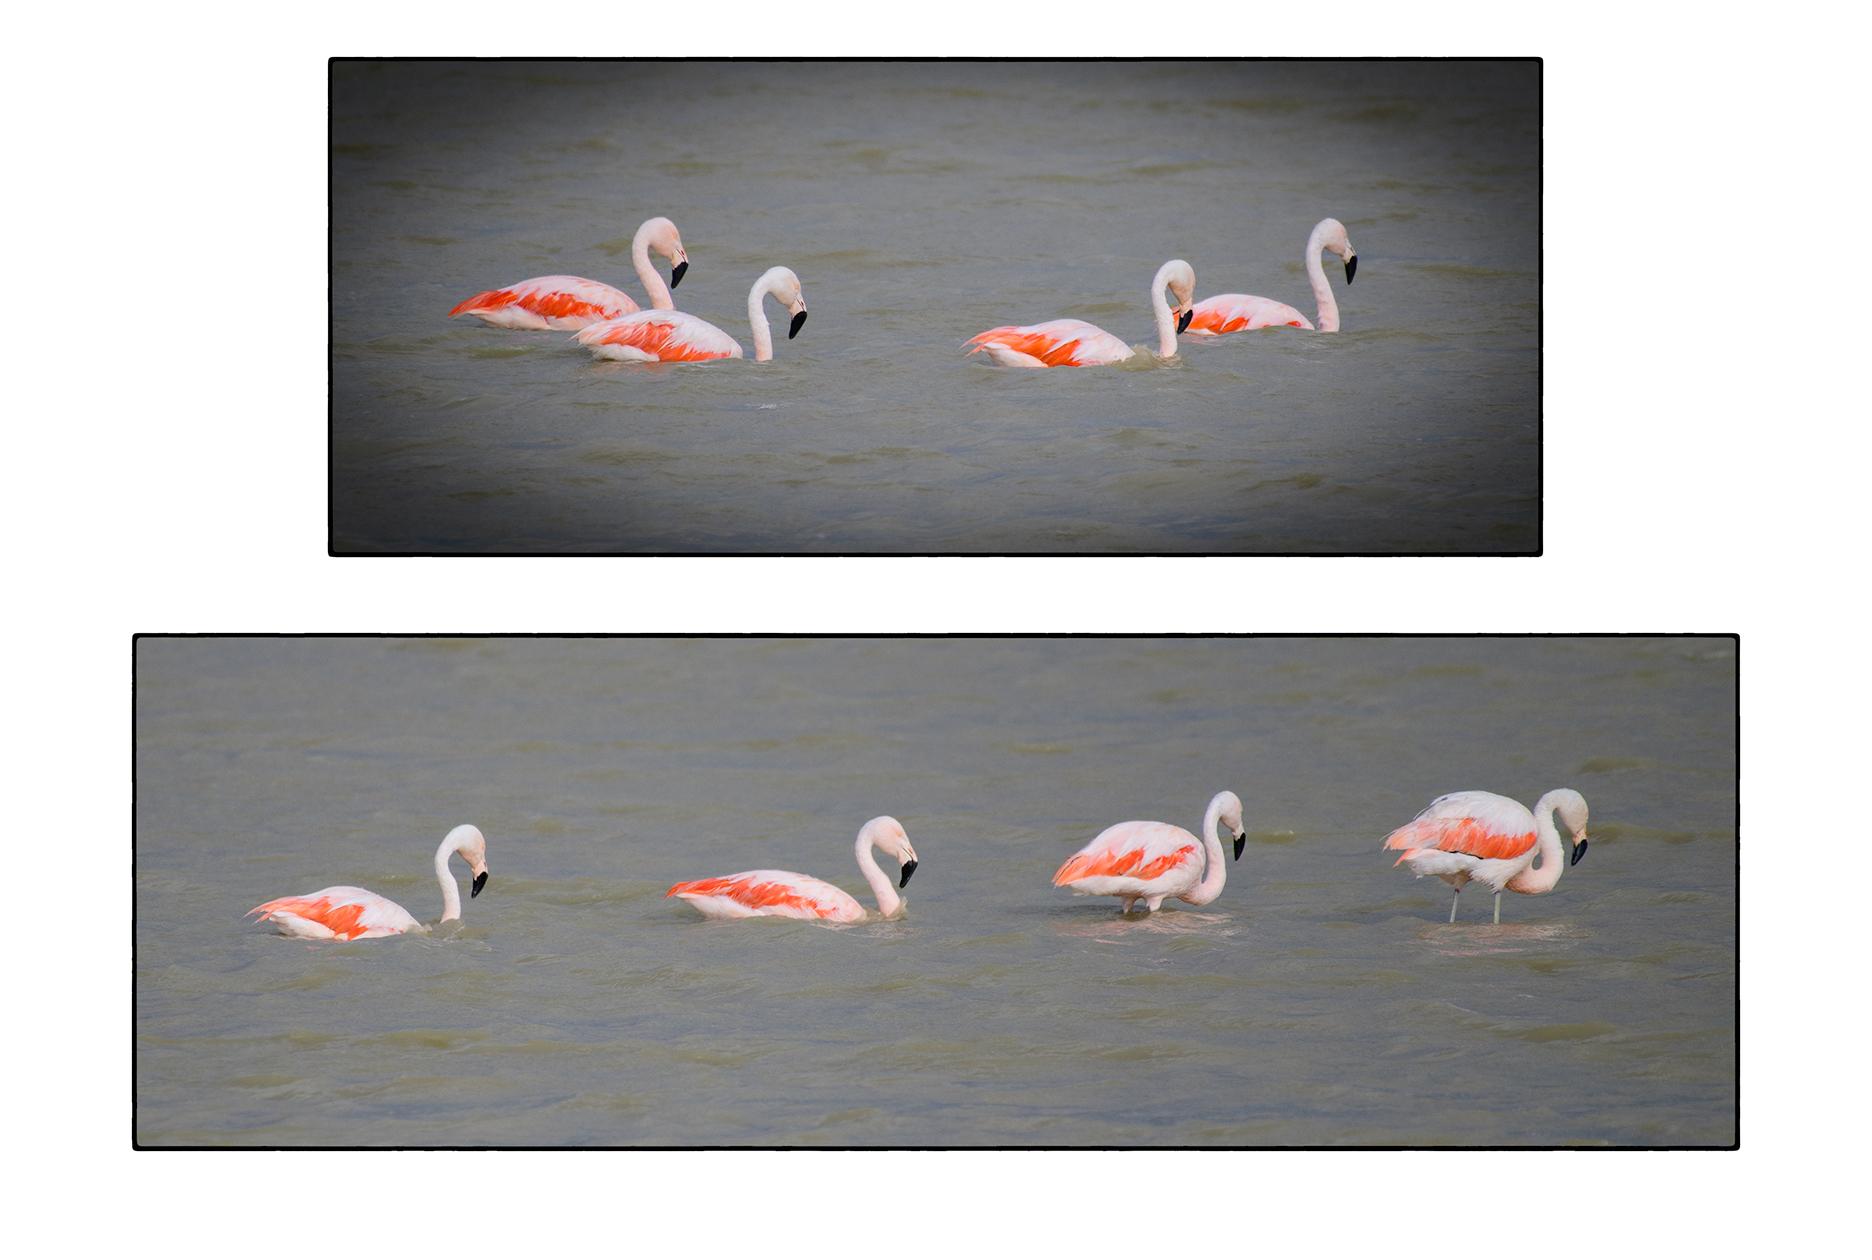 Chilean Flamingos, Punta Arenas, Chile